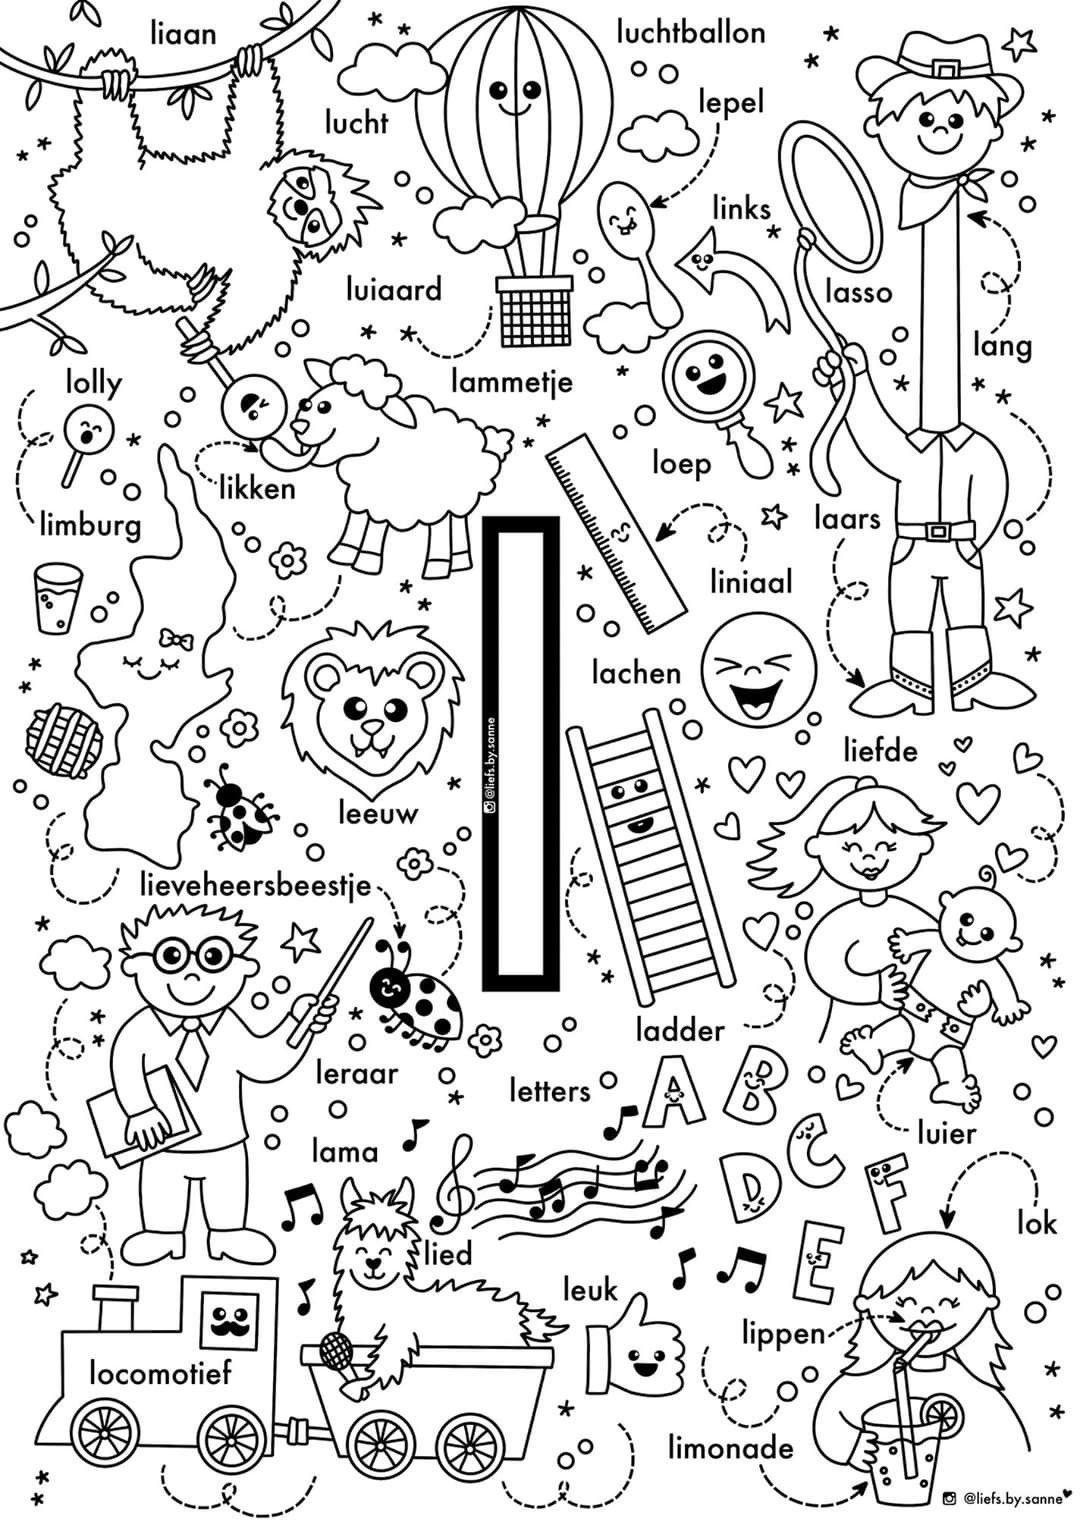 Google Image Result For Https I Pinimg Com Originals 54 75 A7 5475a7489b1501a9c6826c504961c932 J Alfabet Kleurplaten Alfabet Boek Letterherkenning Spelletjes